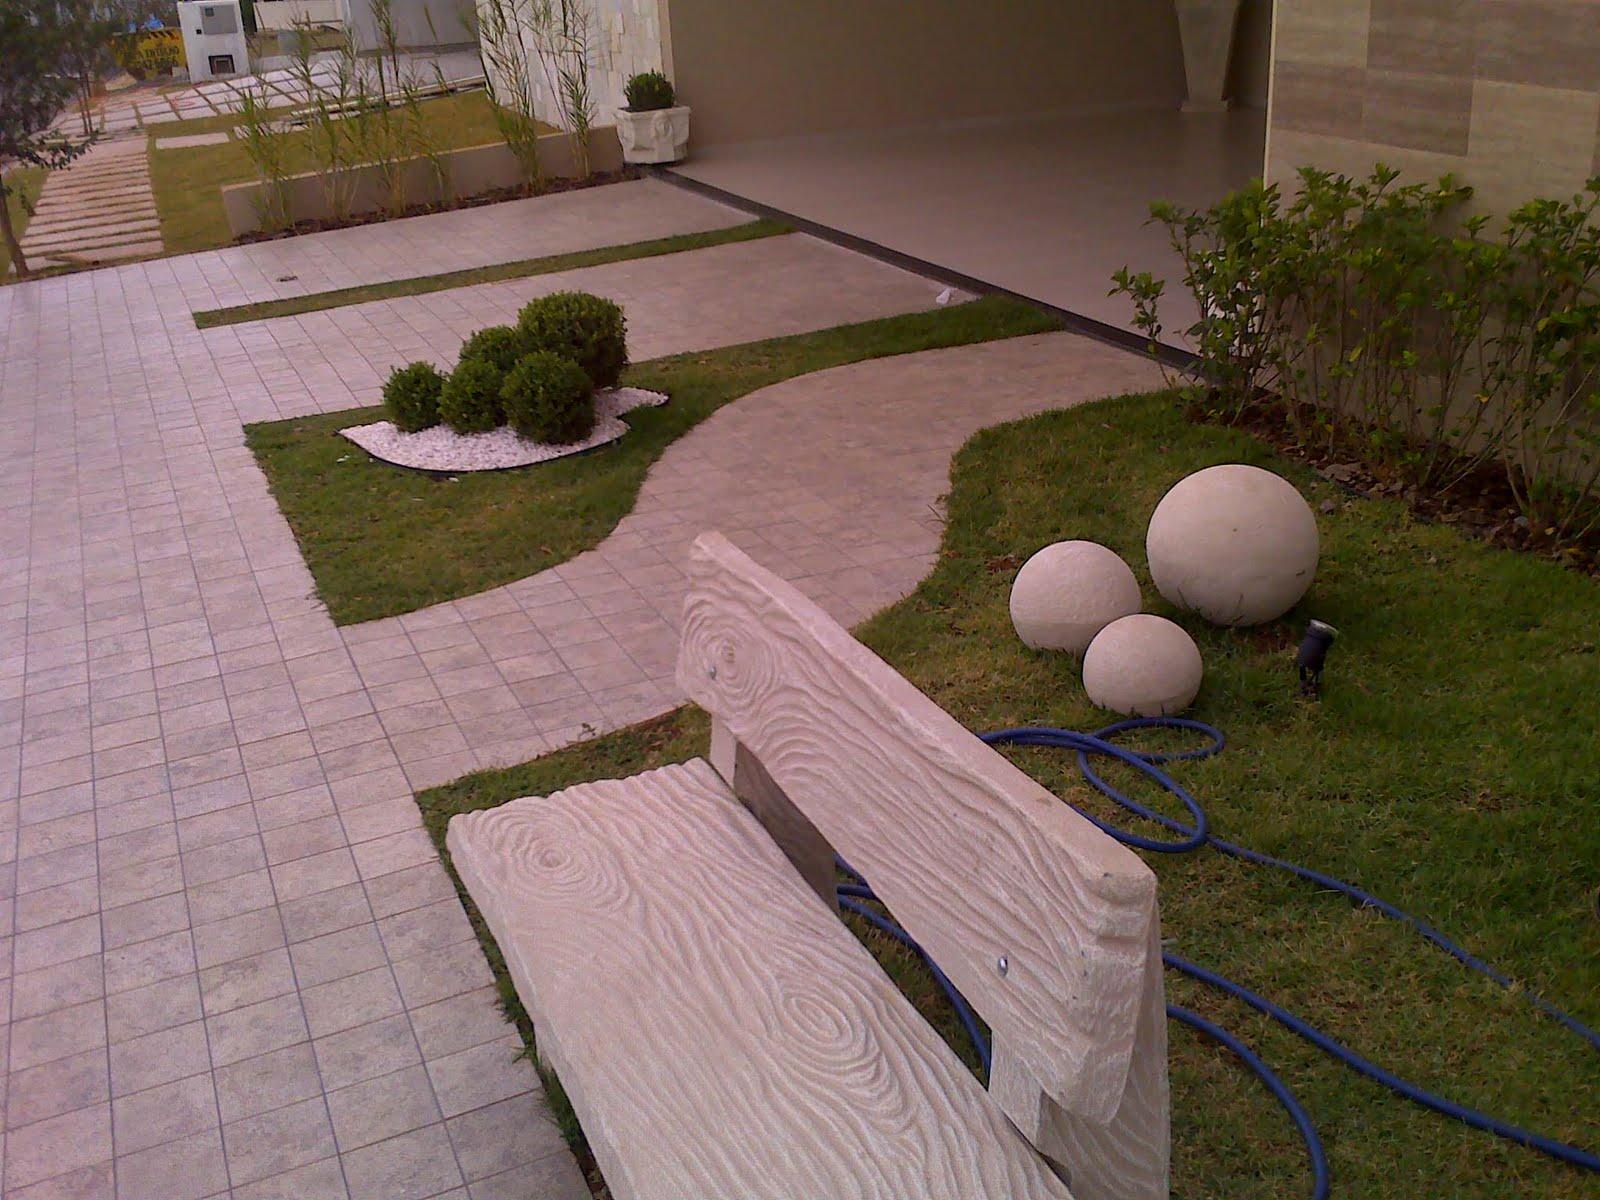 Modelos de pisos para cal adas externas decorando casas for Modelos de jardineras para patios